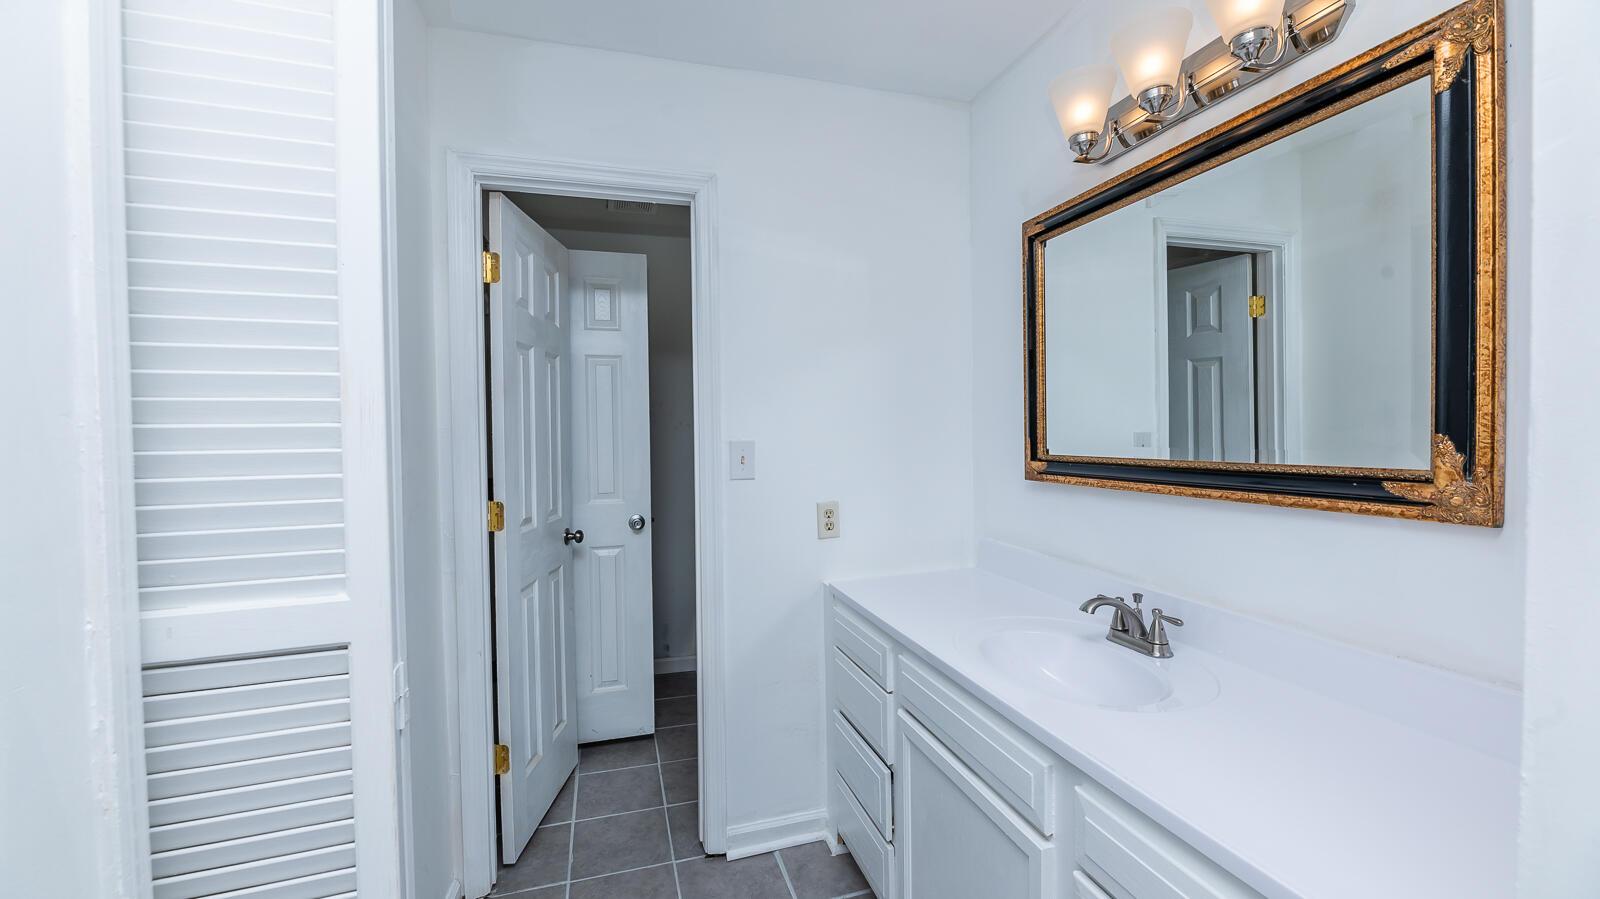 Ashley Villas Homes For Sale - 4315 Briarstone, North Charleston, SC - 21